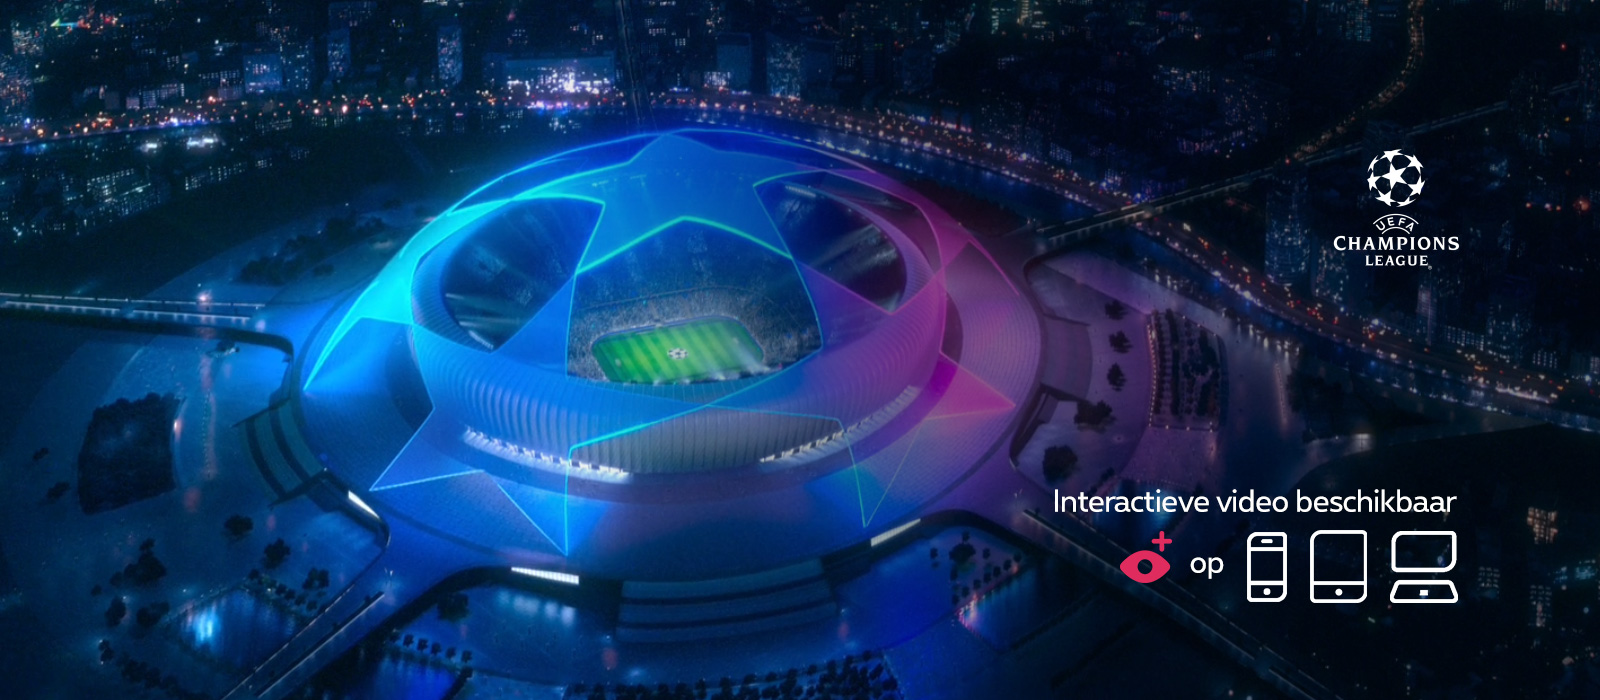 In de UEFA Champions League kan alles!